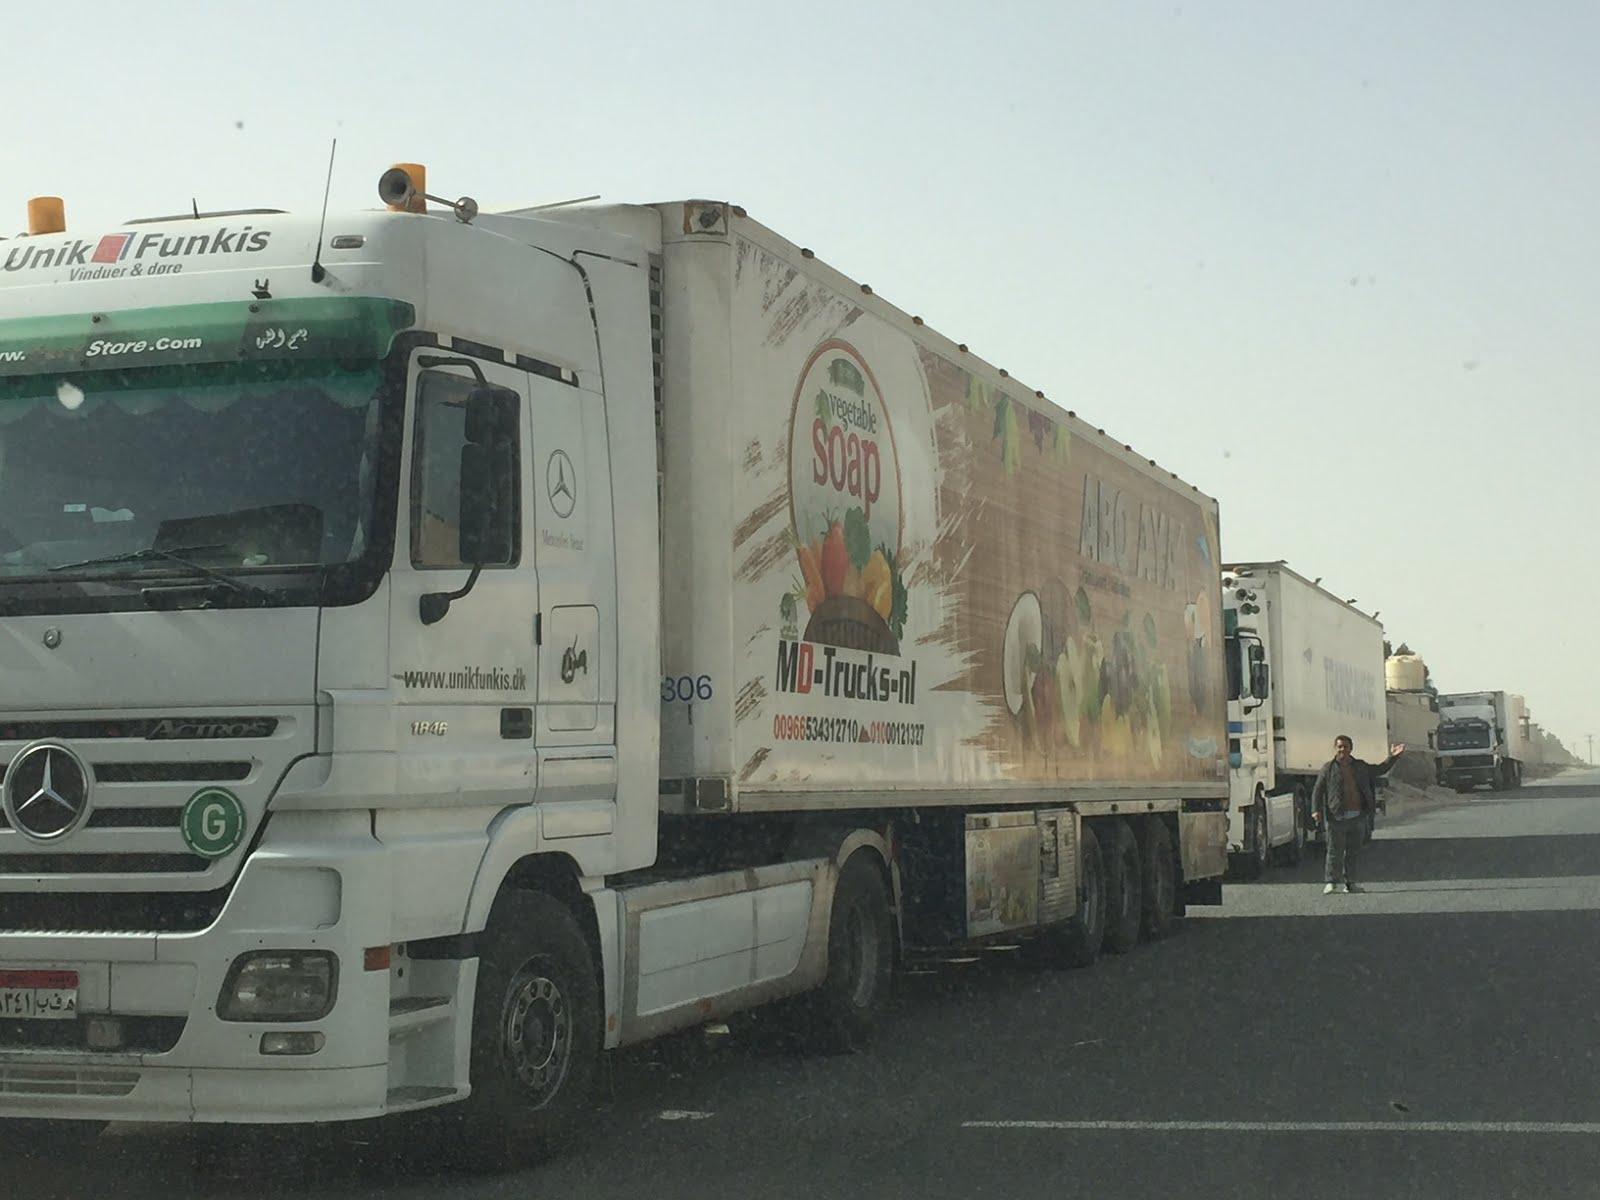 Jual Sisir 7vs Terbaru 2018 Tcash Vaganza 17 Botol Minum Olahraga Aluminium 750ml Biru Catatan Ardis Family Truk Buah Dan Sayur Di Kuwait Panjang Sekali Antrian Masuk Ke